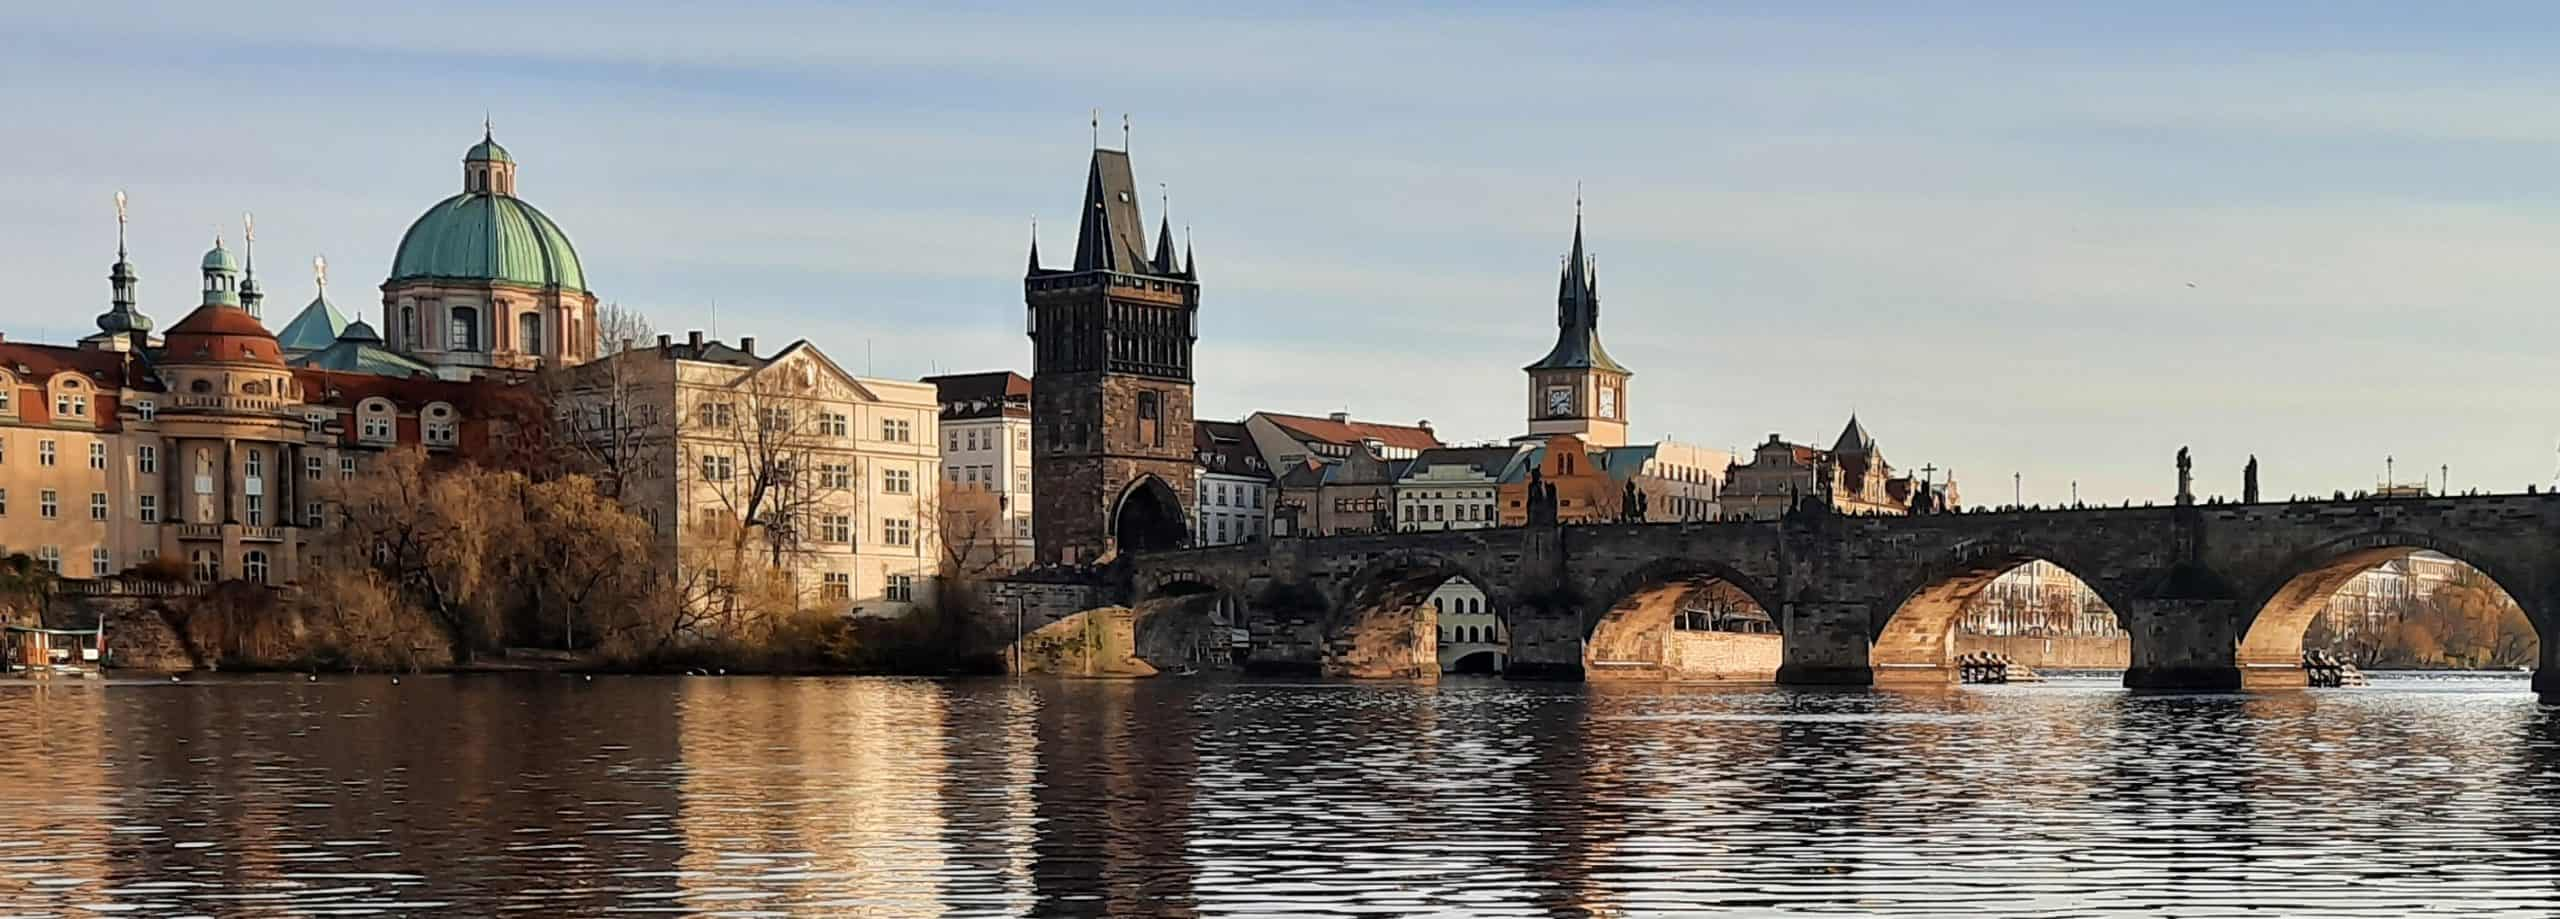 Kam v Praze s dětmi: Jednodenní výlet do Prahy